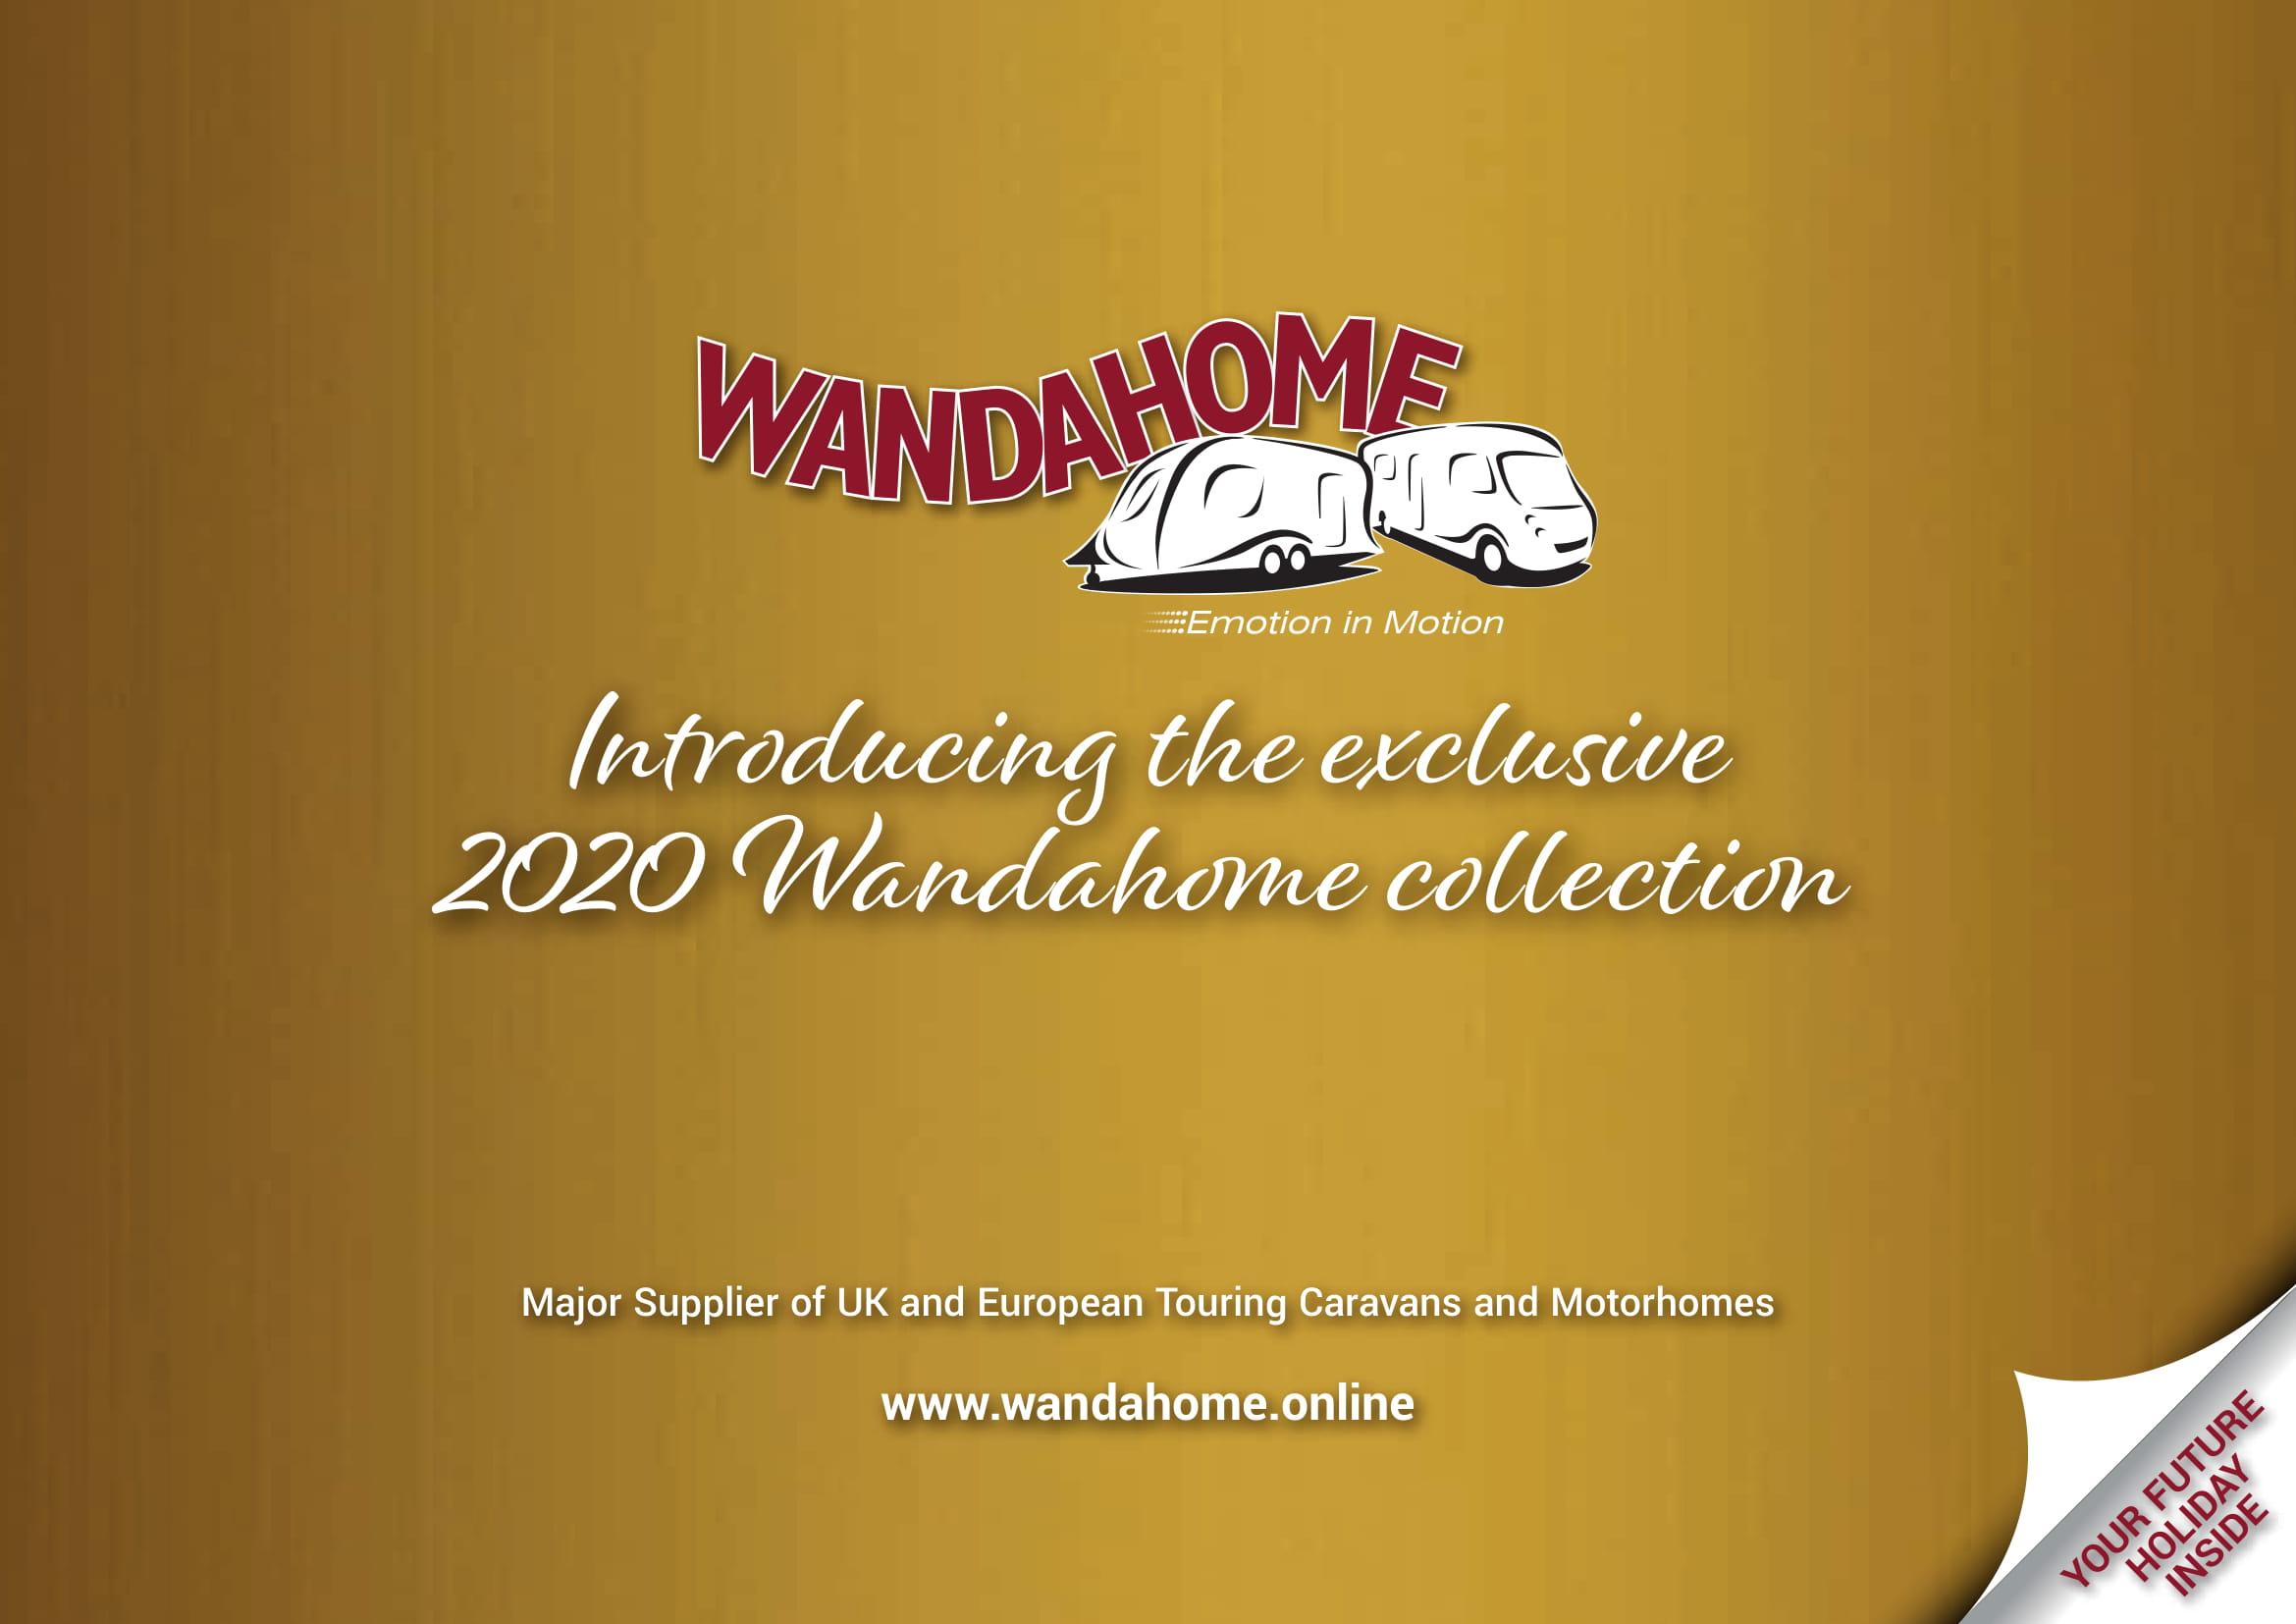 The Wandahome 2020 Brochure